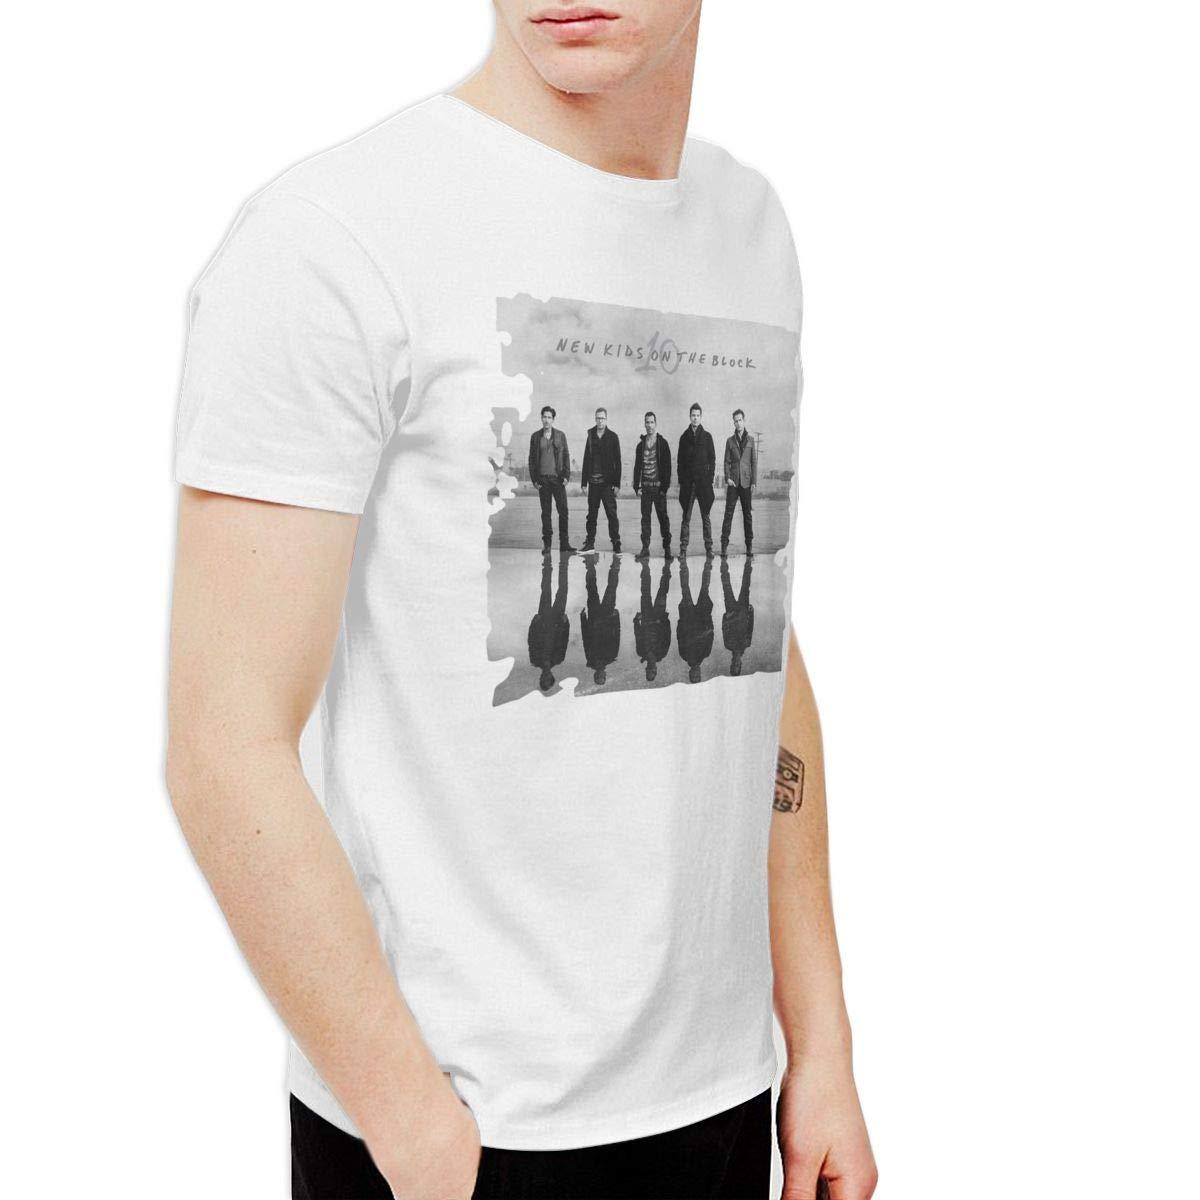 Rvfge New On The Block 10 Fashion Short Sleeve T Shirt